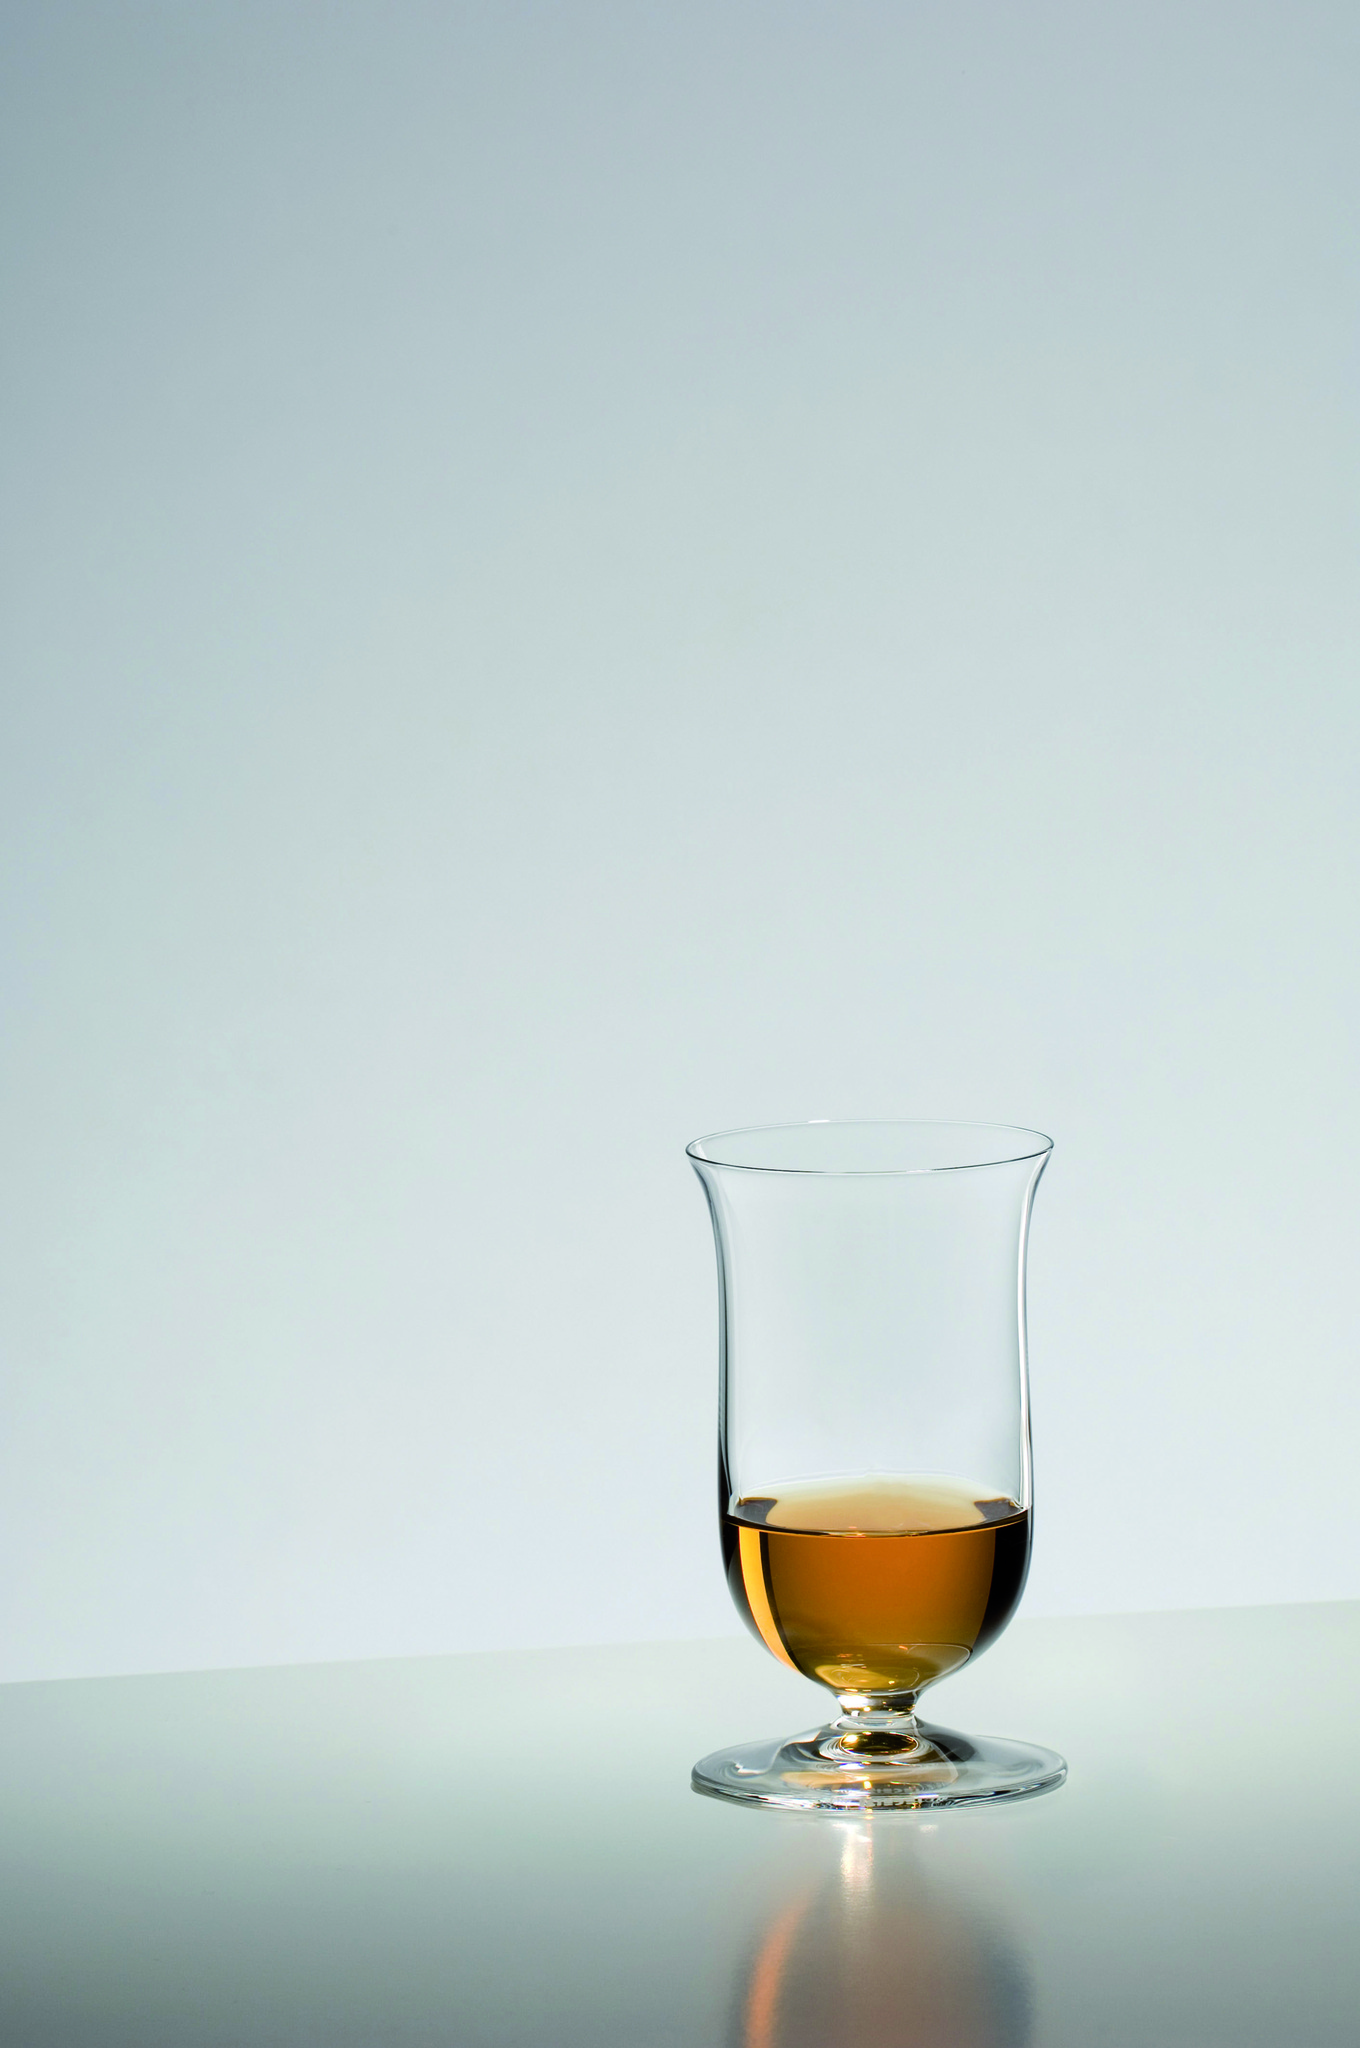 Бокалы Набор бокалов для виски 2шт 200мл Riedel Vinum Single Malt Whisky nabor-bokalov-dlya-viski-2-sht-200-ml-riedel-vinum-single-malt-whisky-avstriya.jpg